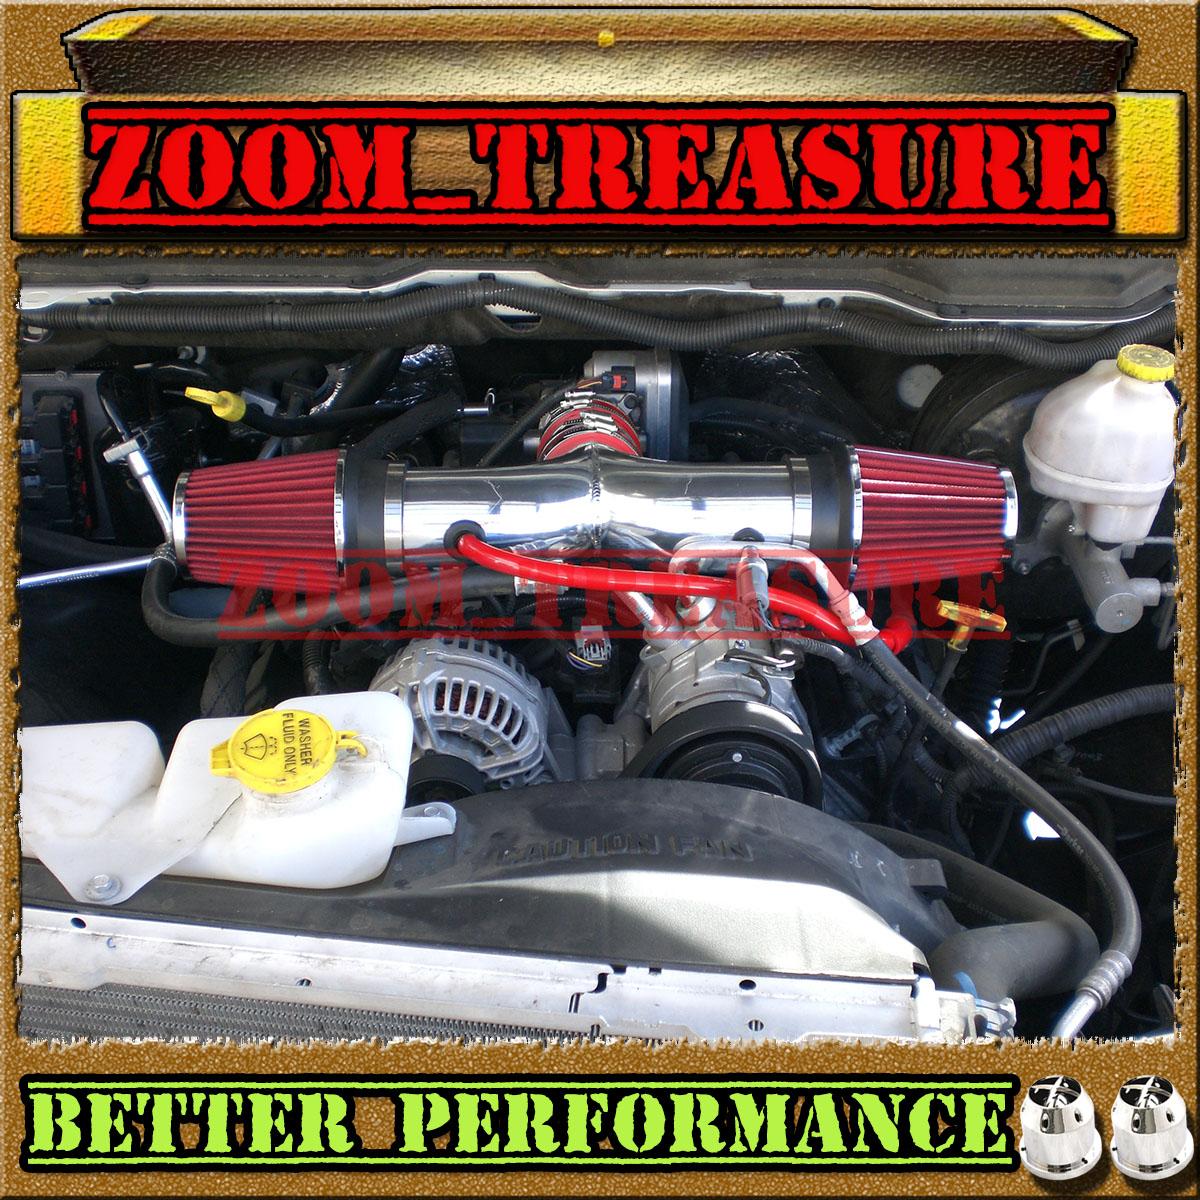 RED BLUE DUAL 03 04 05-09 DODGE RAM//DURANGO//ASPEN 5.7L V8 HEMI TWIN AIR INTAKE